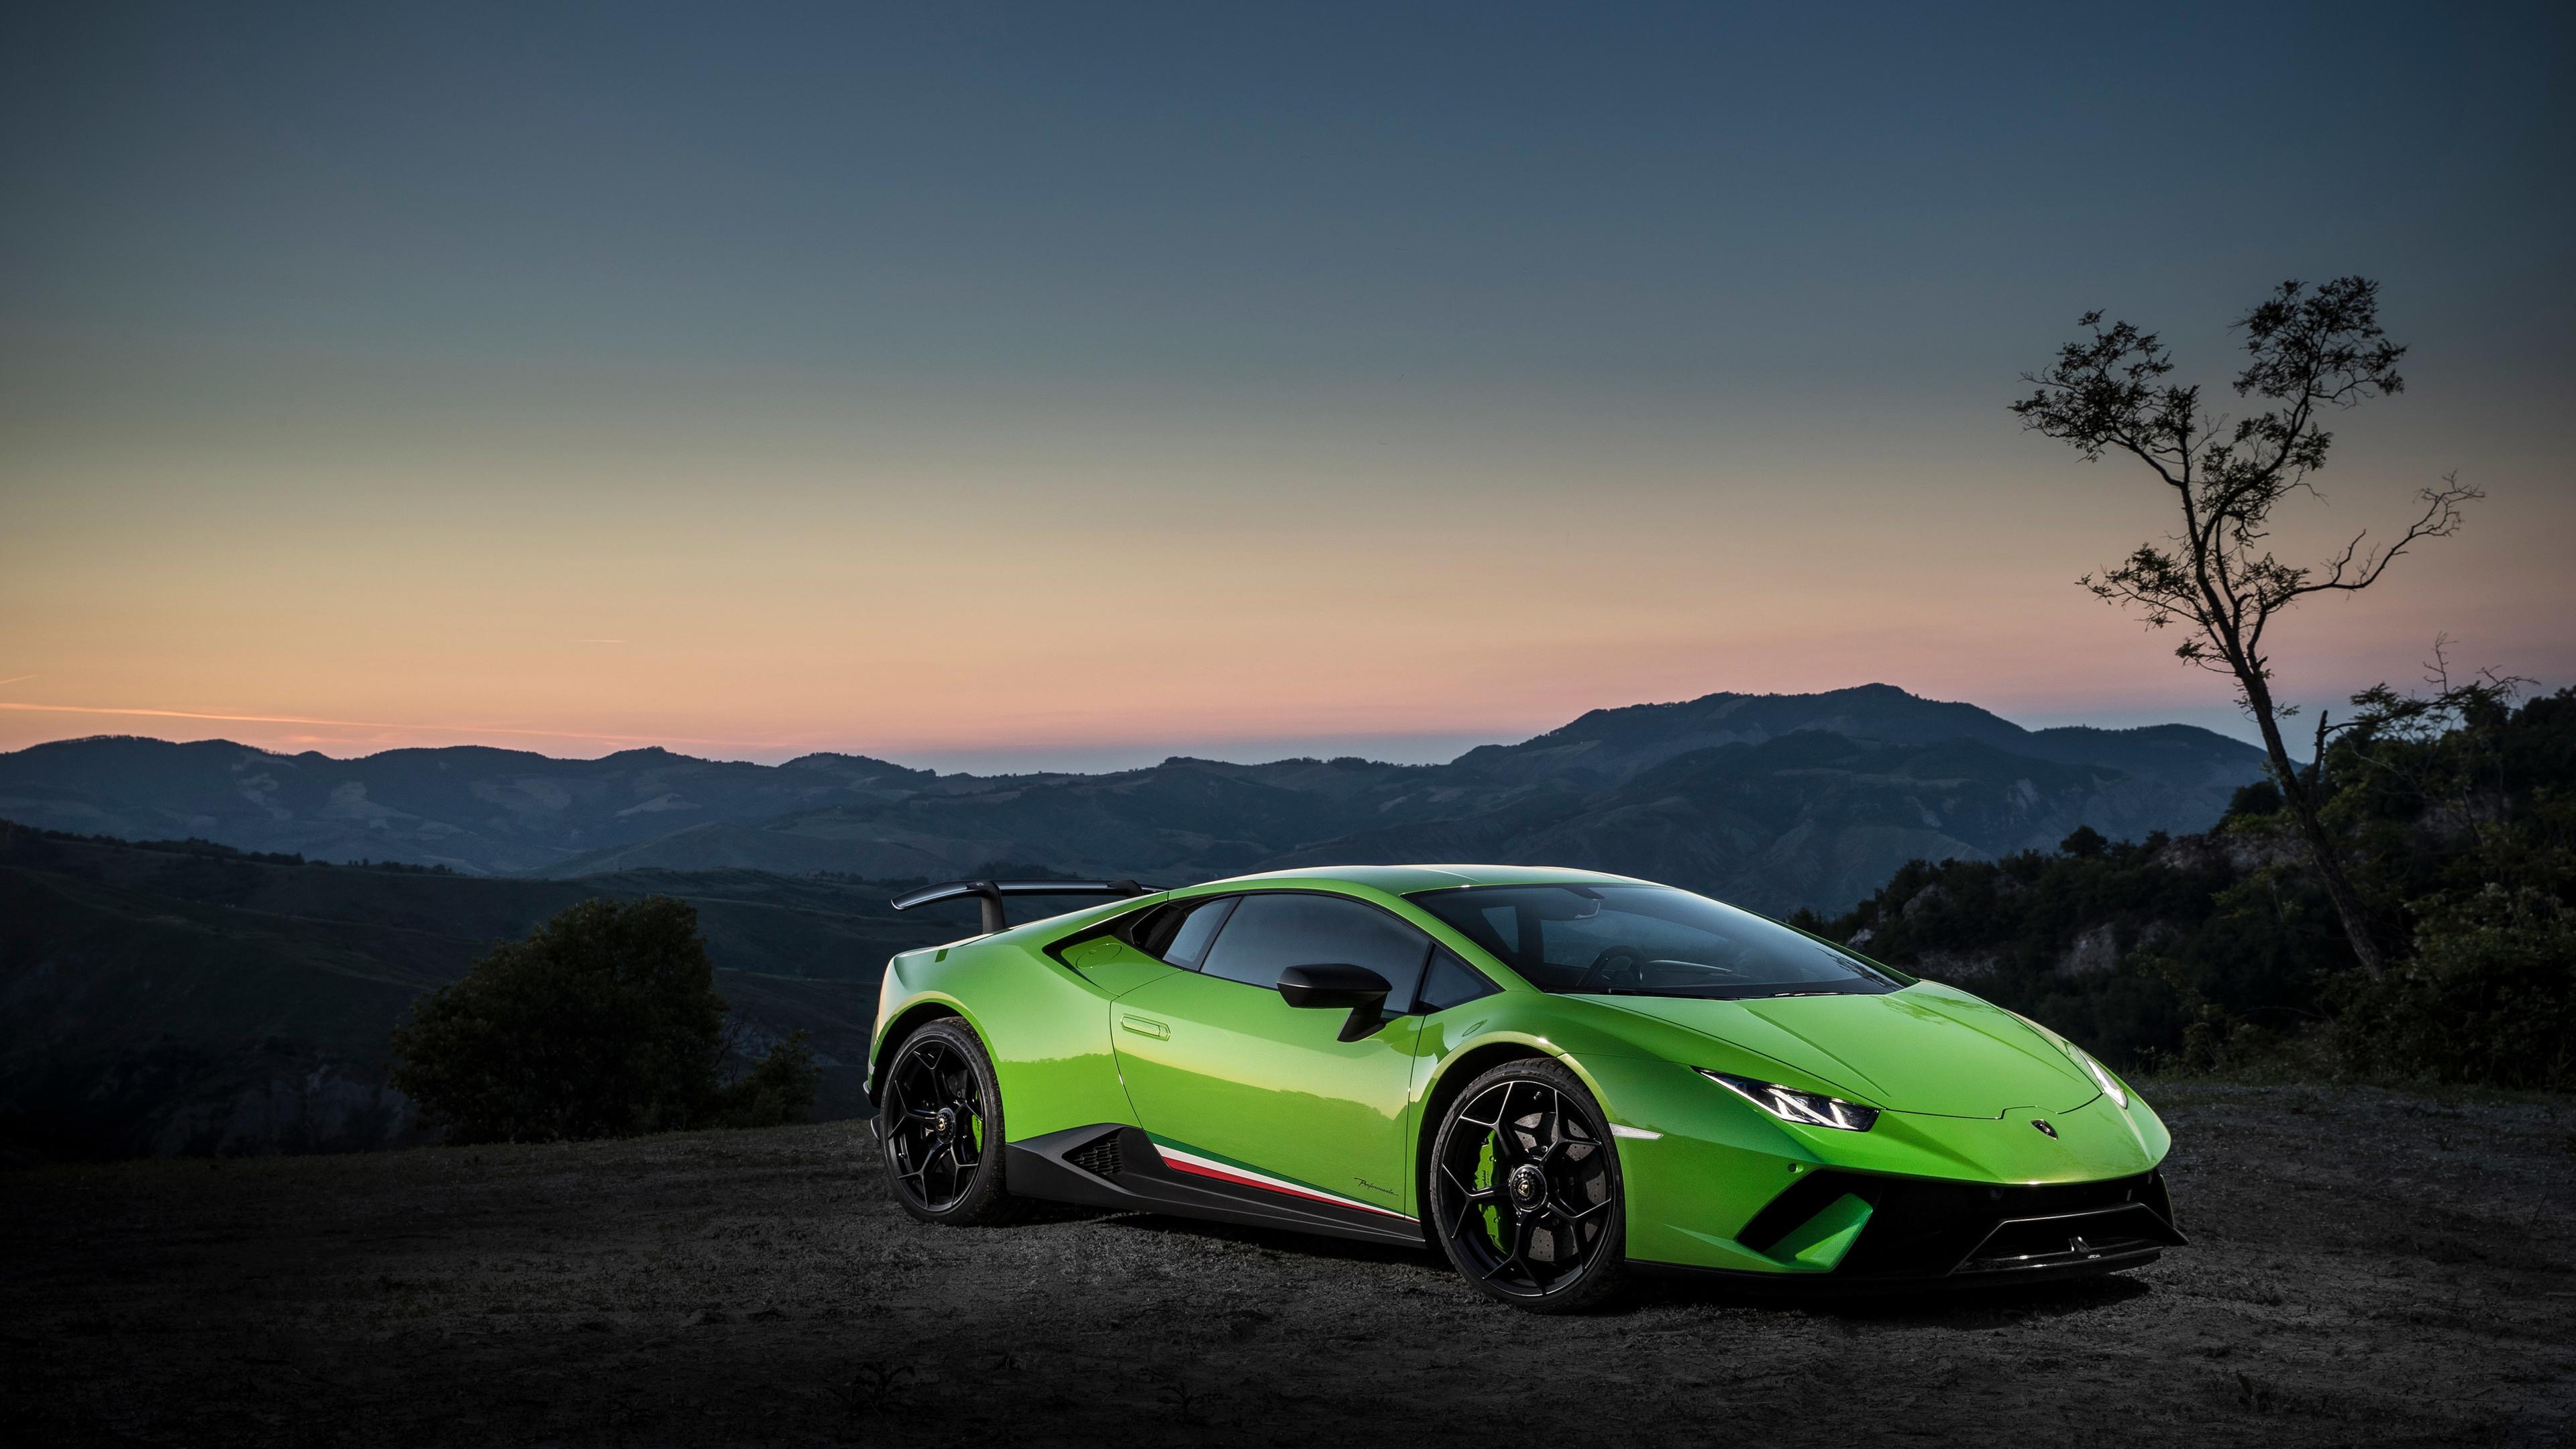 4k Lamborghini Huracan Performante lamborghini wallpapers ...